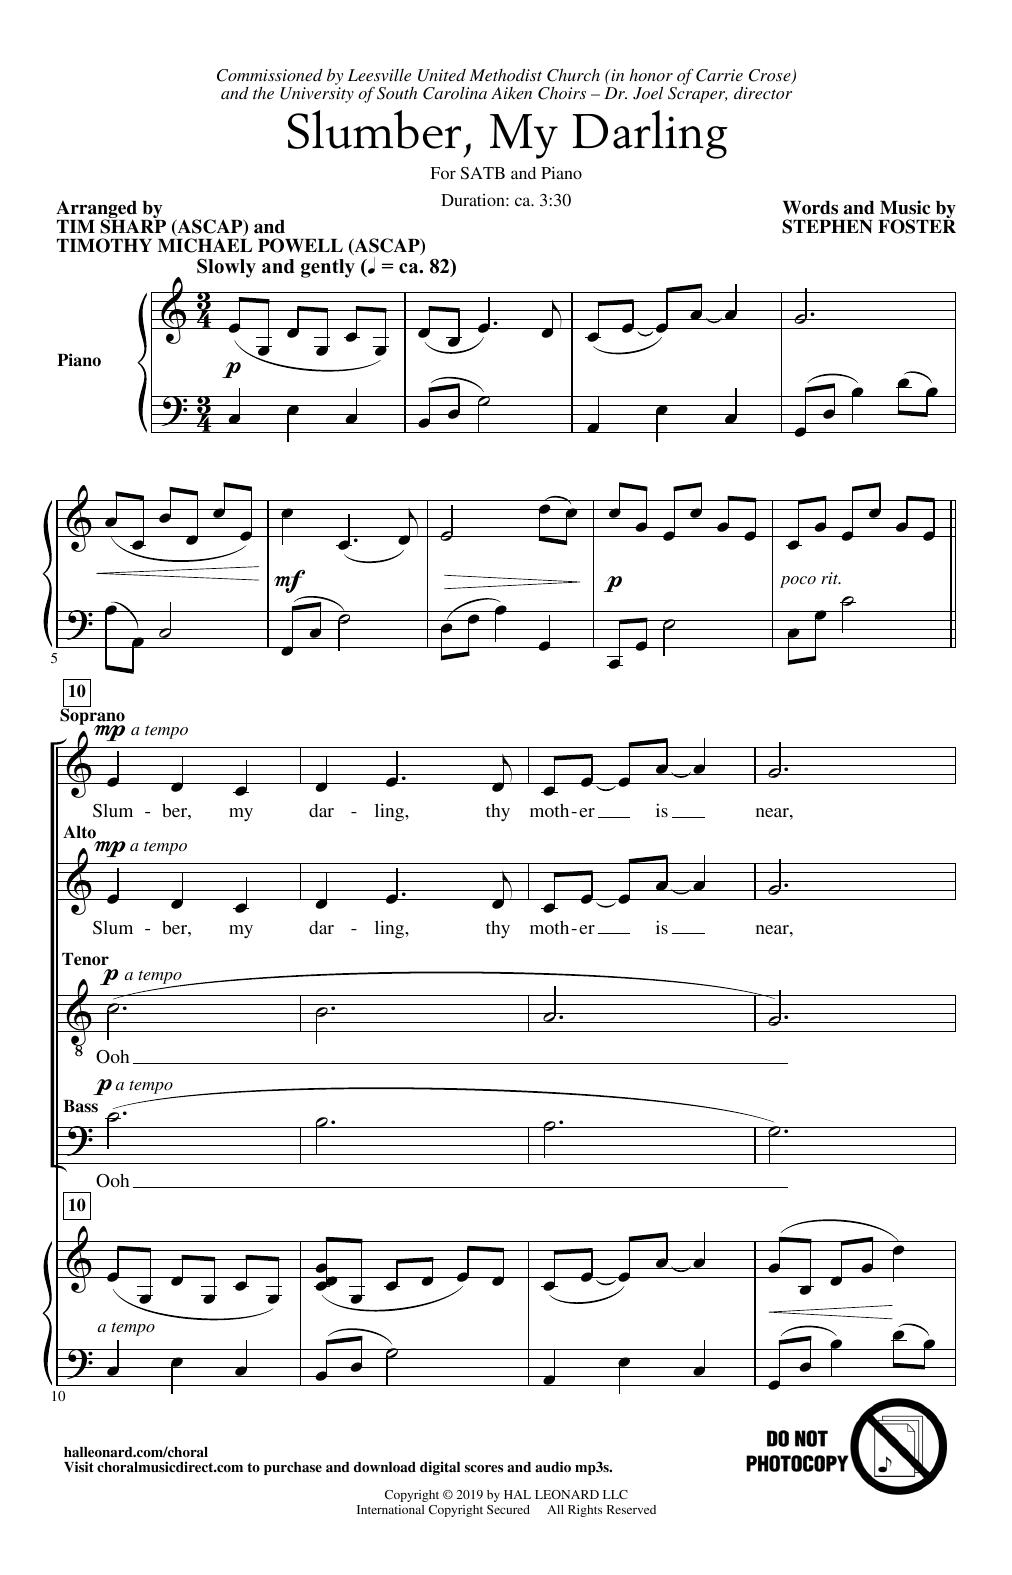 Slumber My Darling (arr. Tim Sharp and Timothy Michael Powell) (SATB Choir)